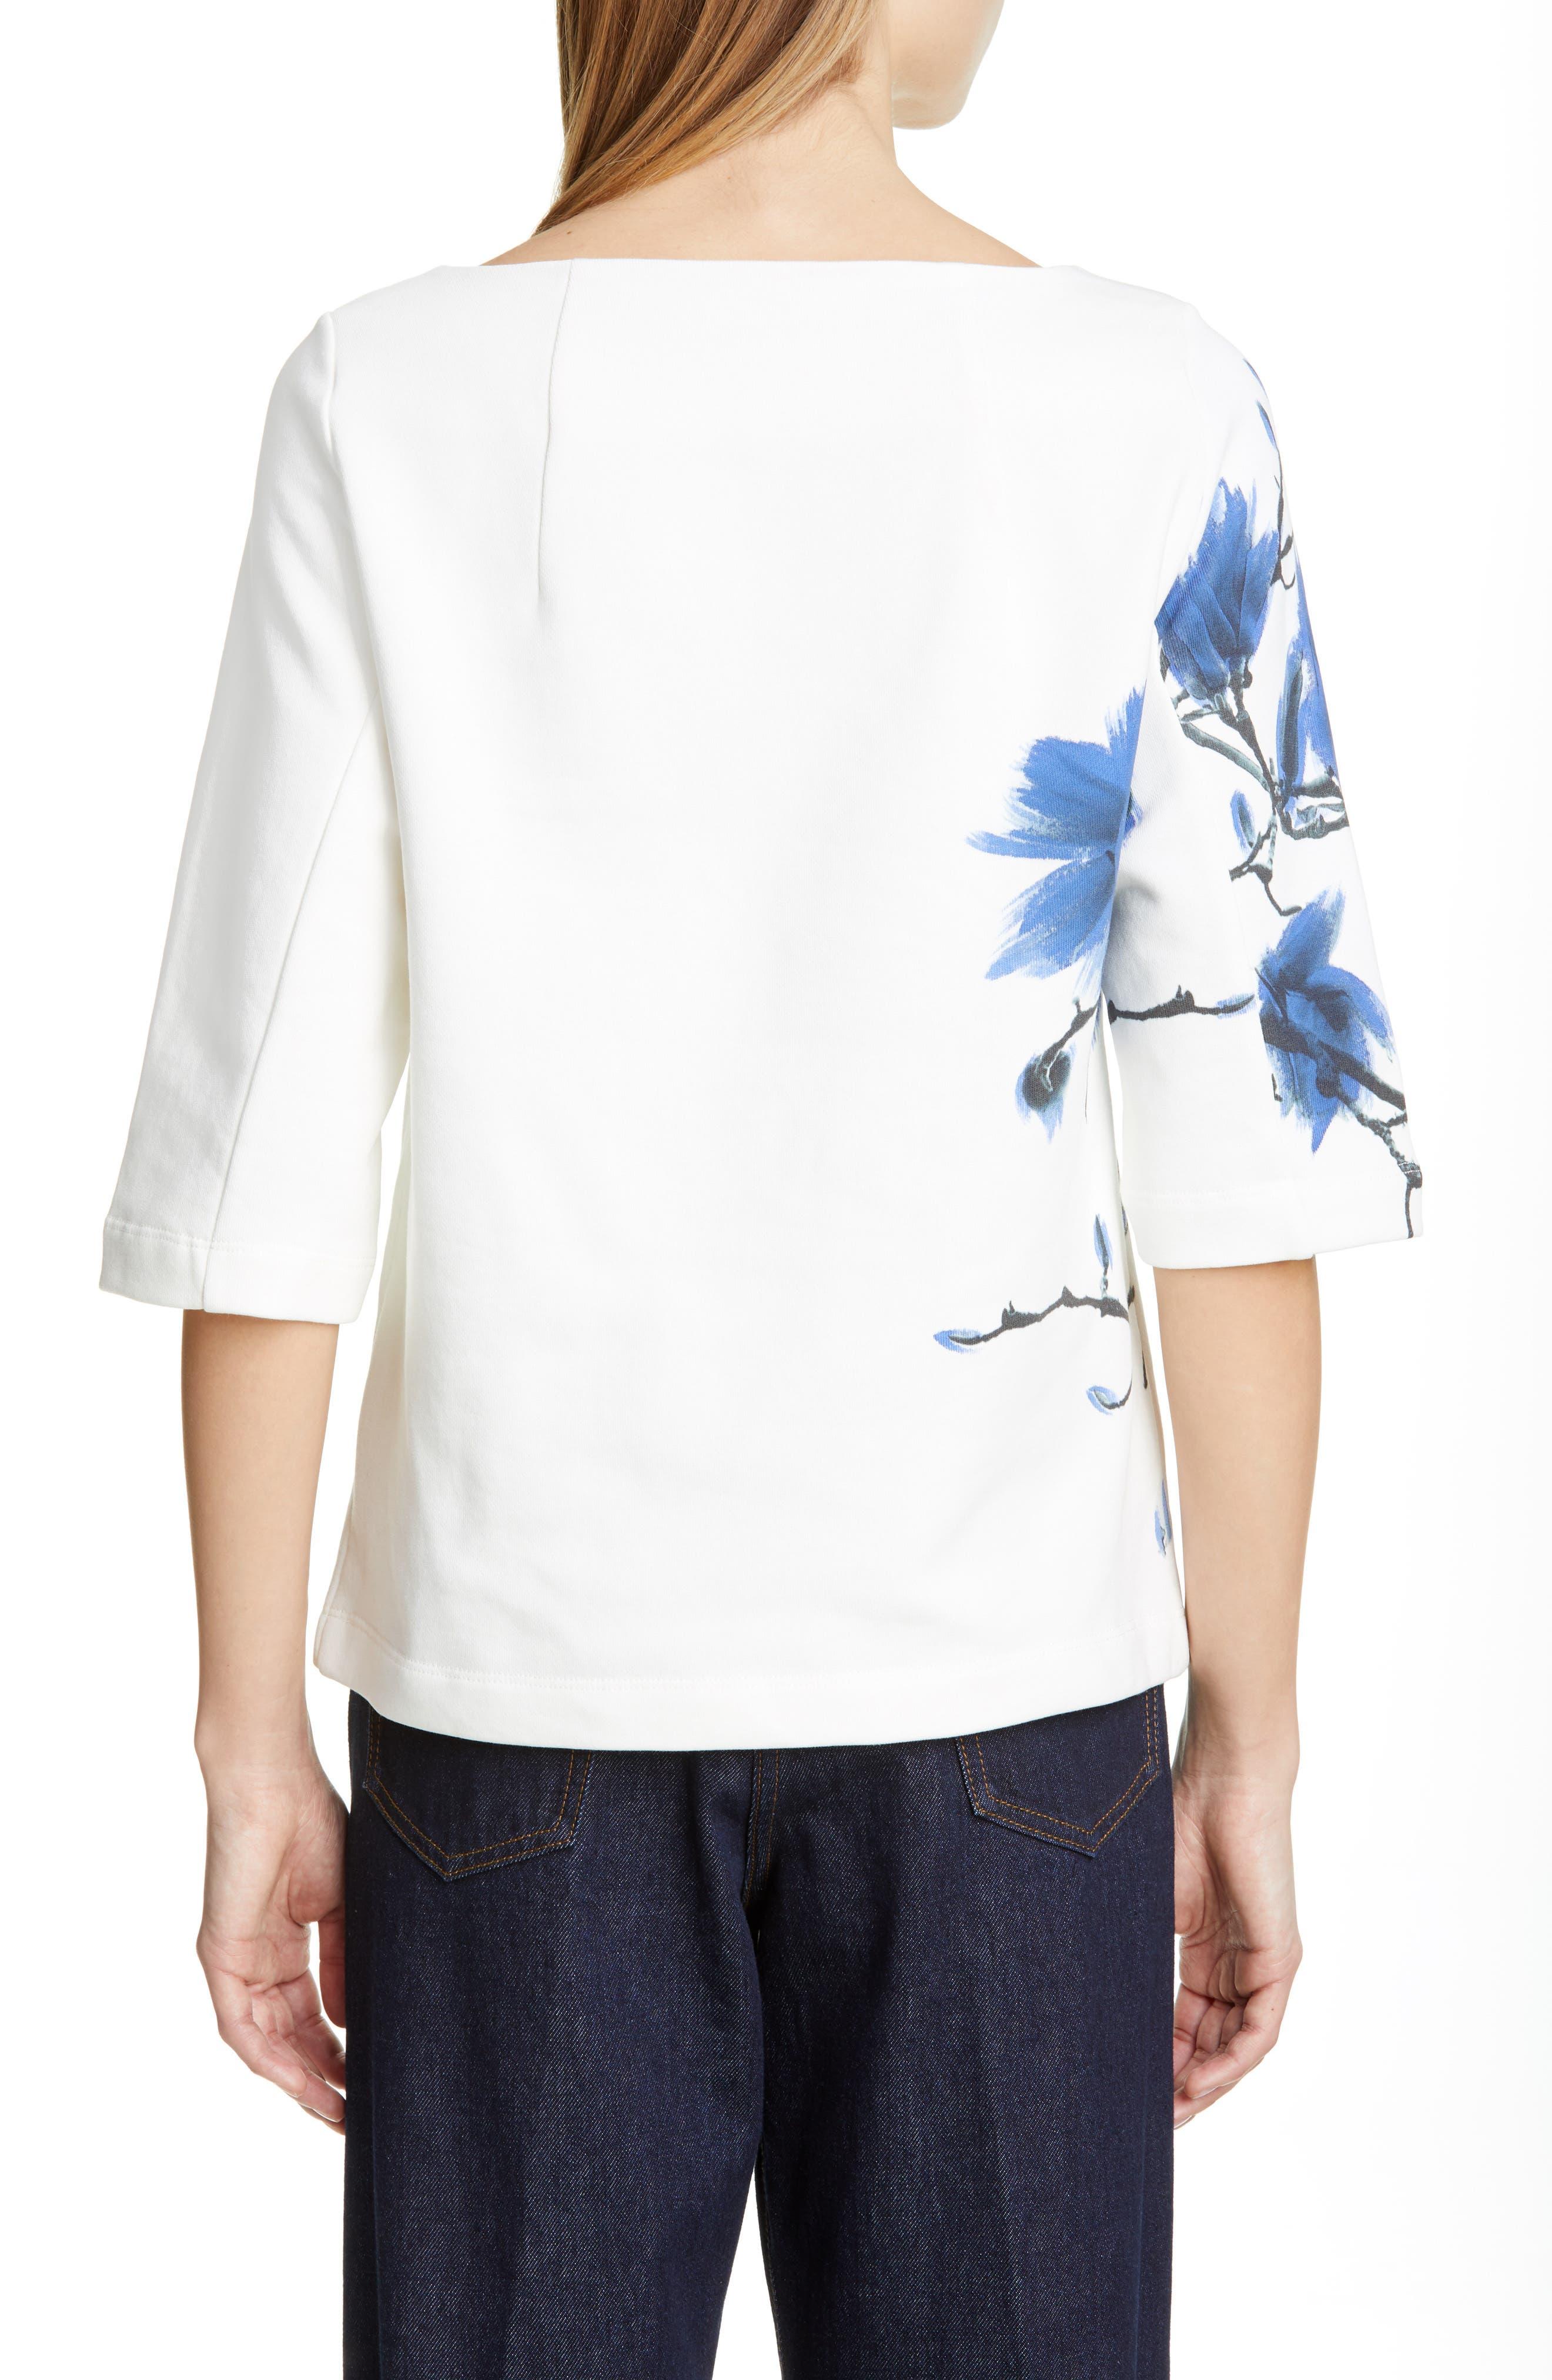 DRIES VAN NOTEN, Haendel Hand Painted Floral Top, Alternate thumbnail 2, color, BLACK